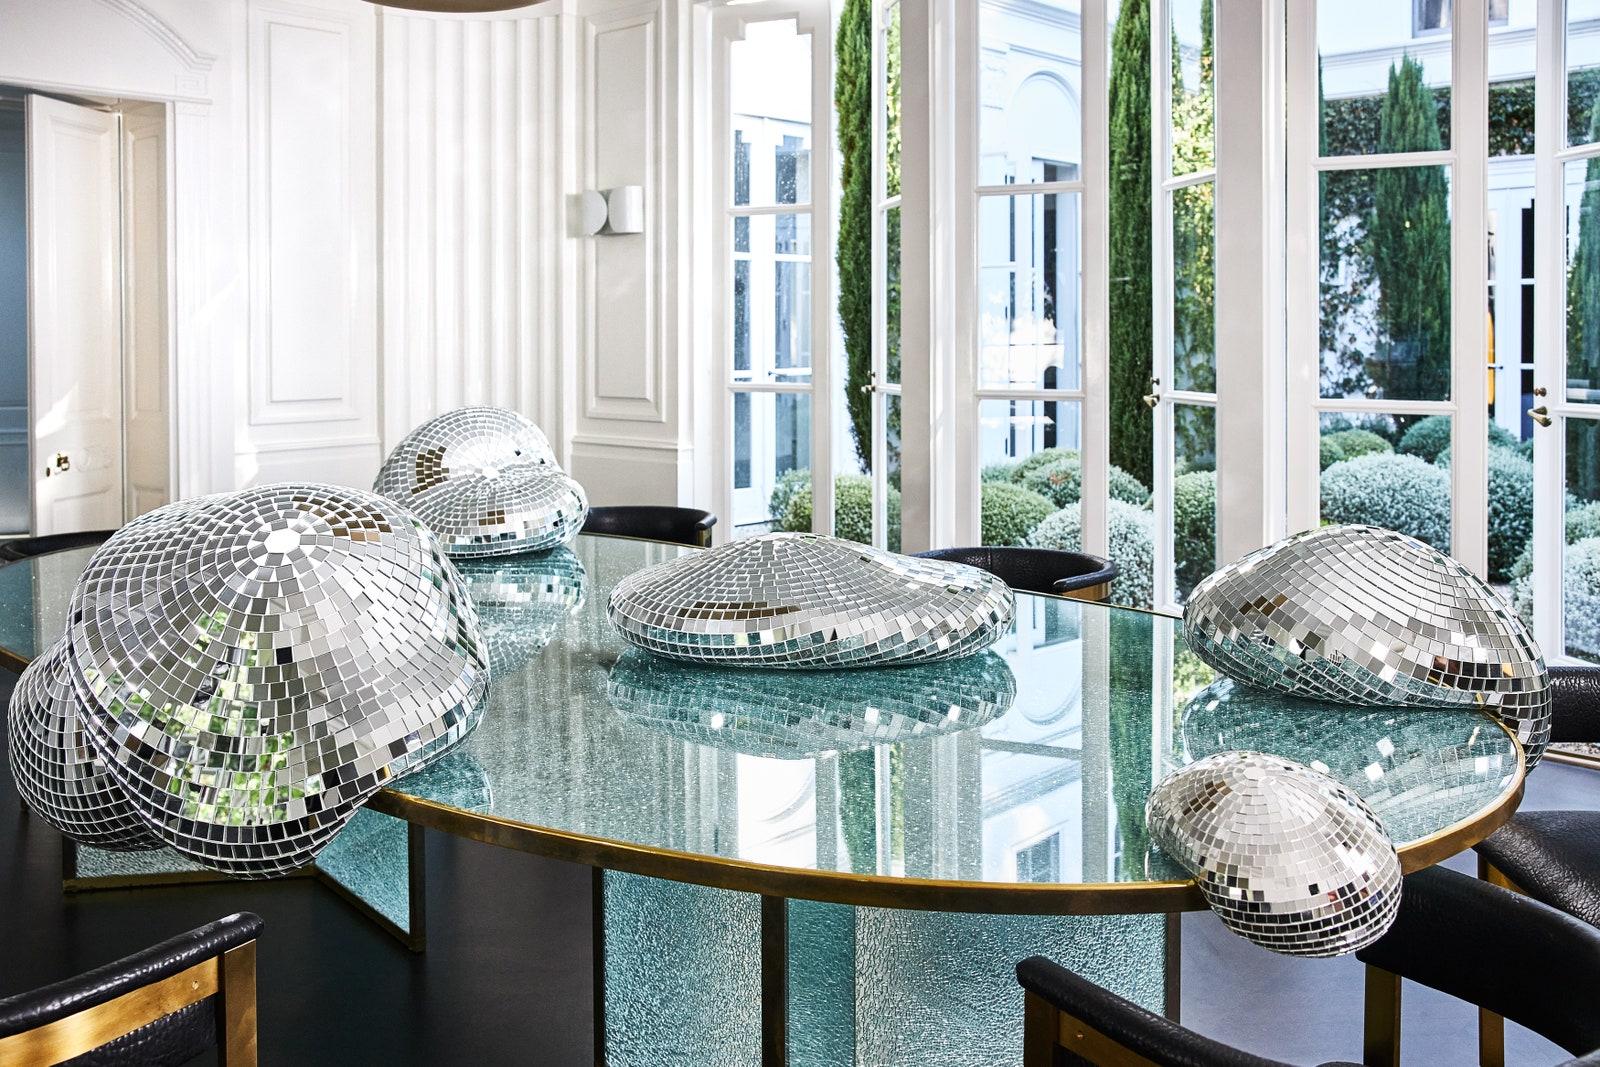 Disco balls by Rotganzen